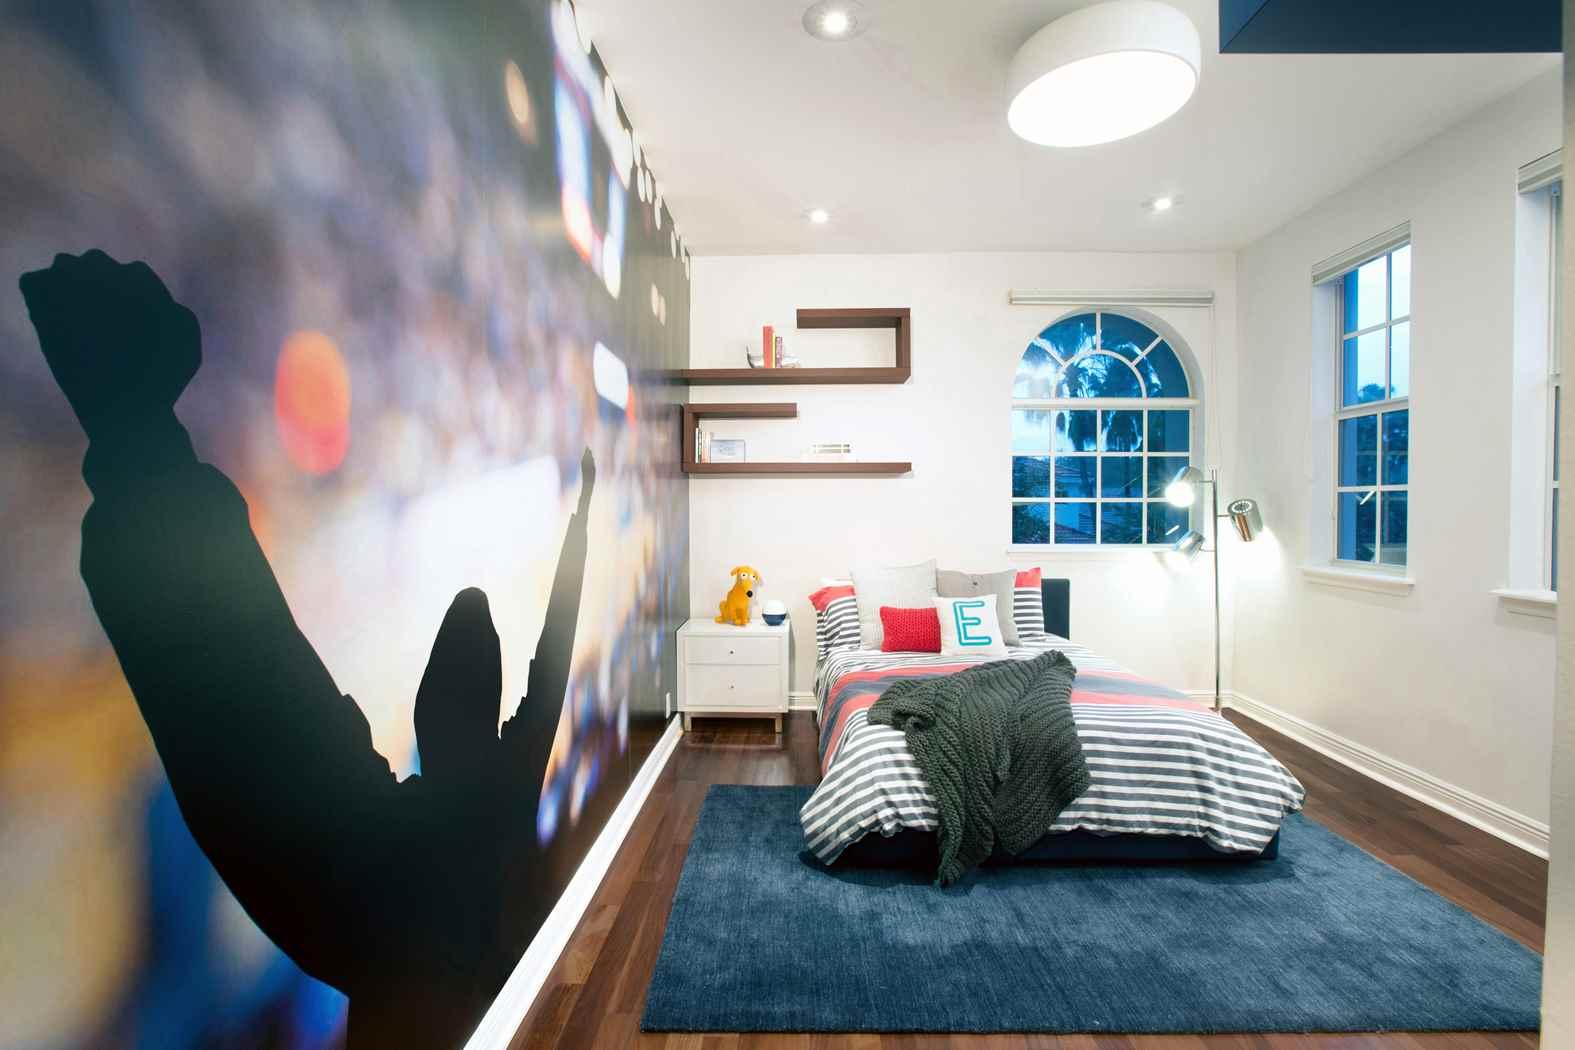 Transitional Design Residential Interior Design By Dkor